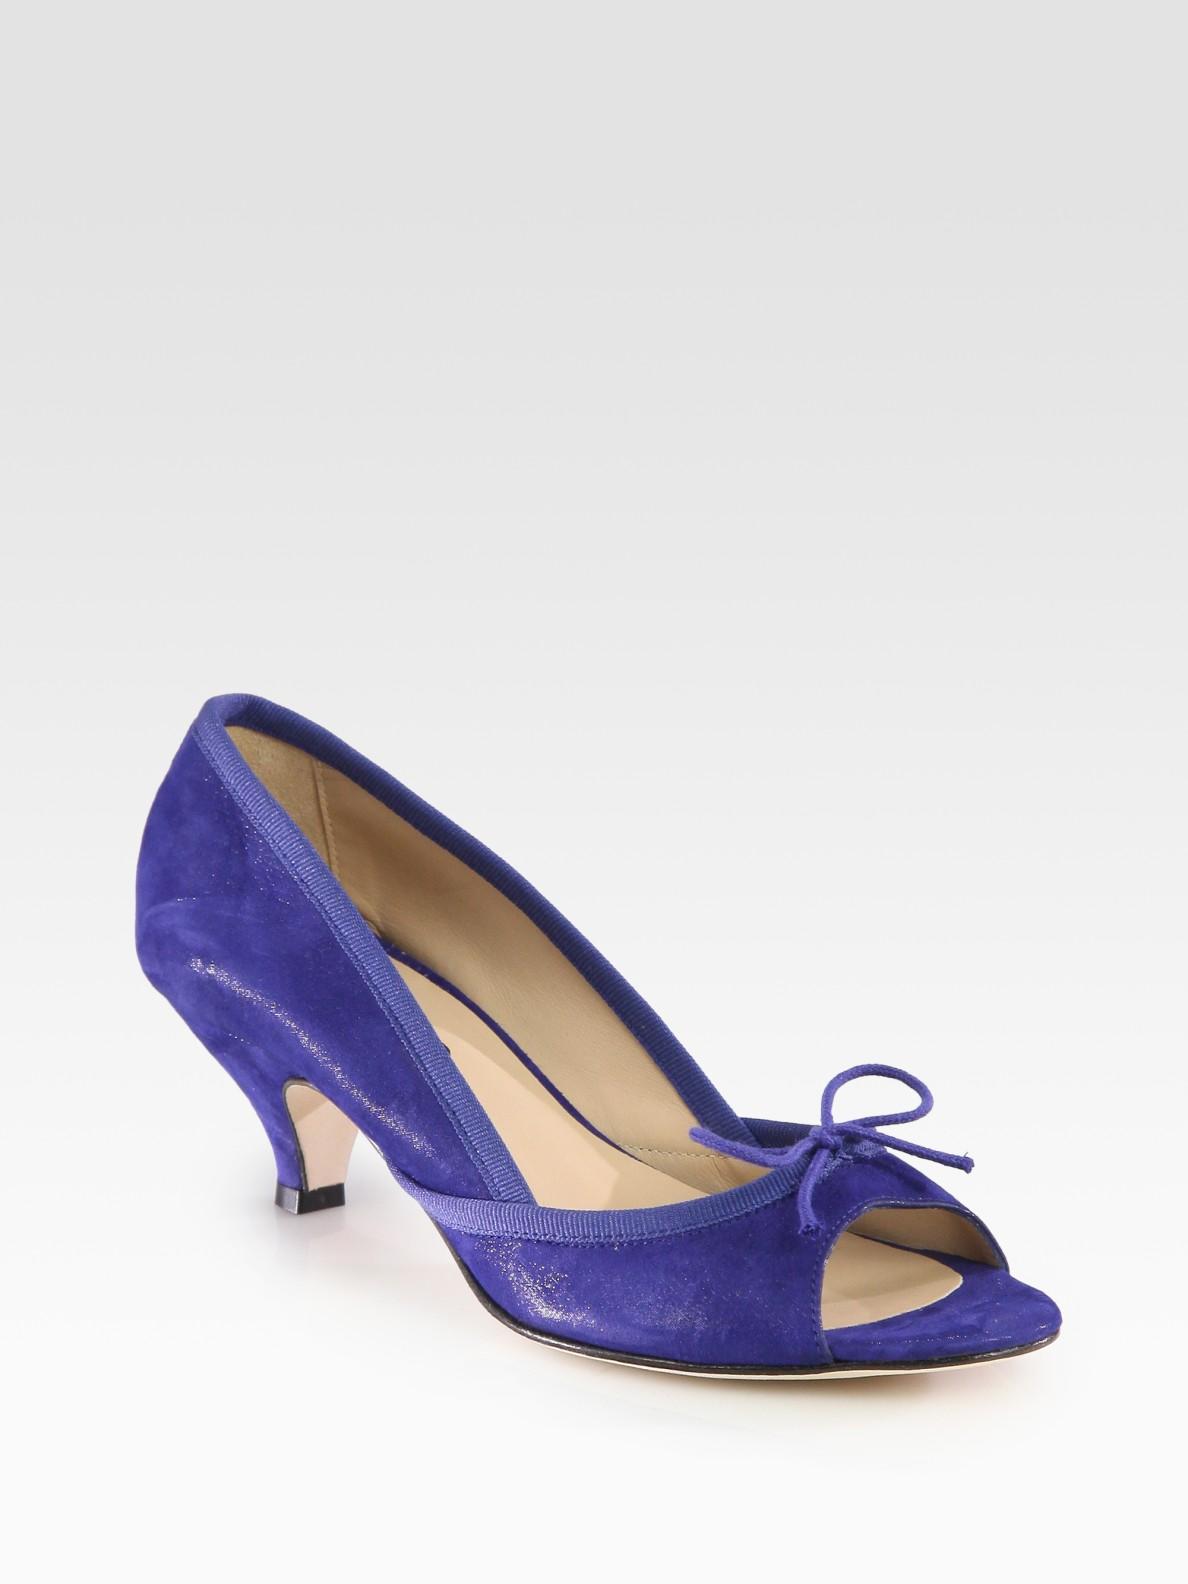 Horizon Blue Wedding Shoes - Wedding Shoes